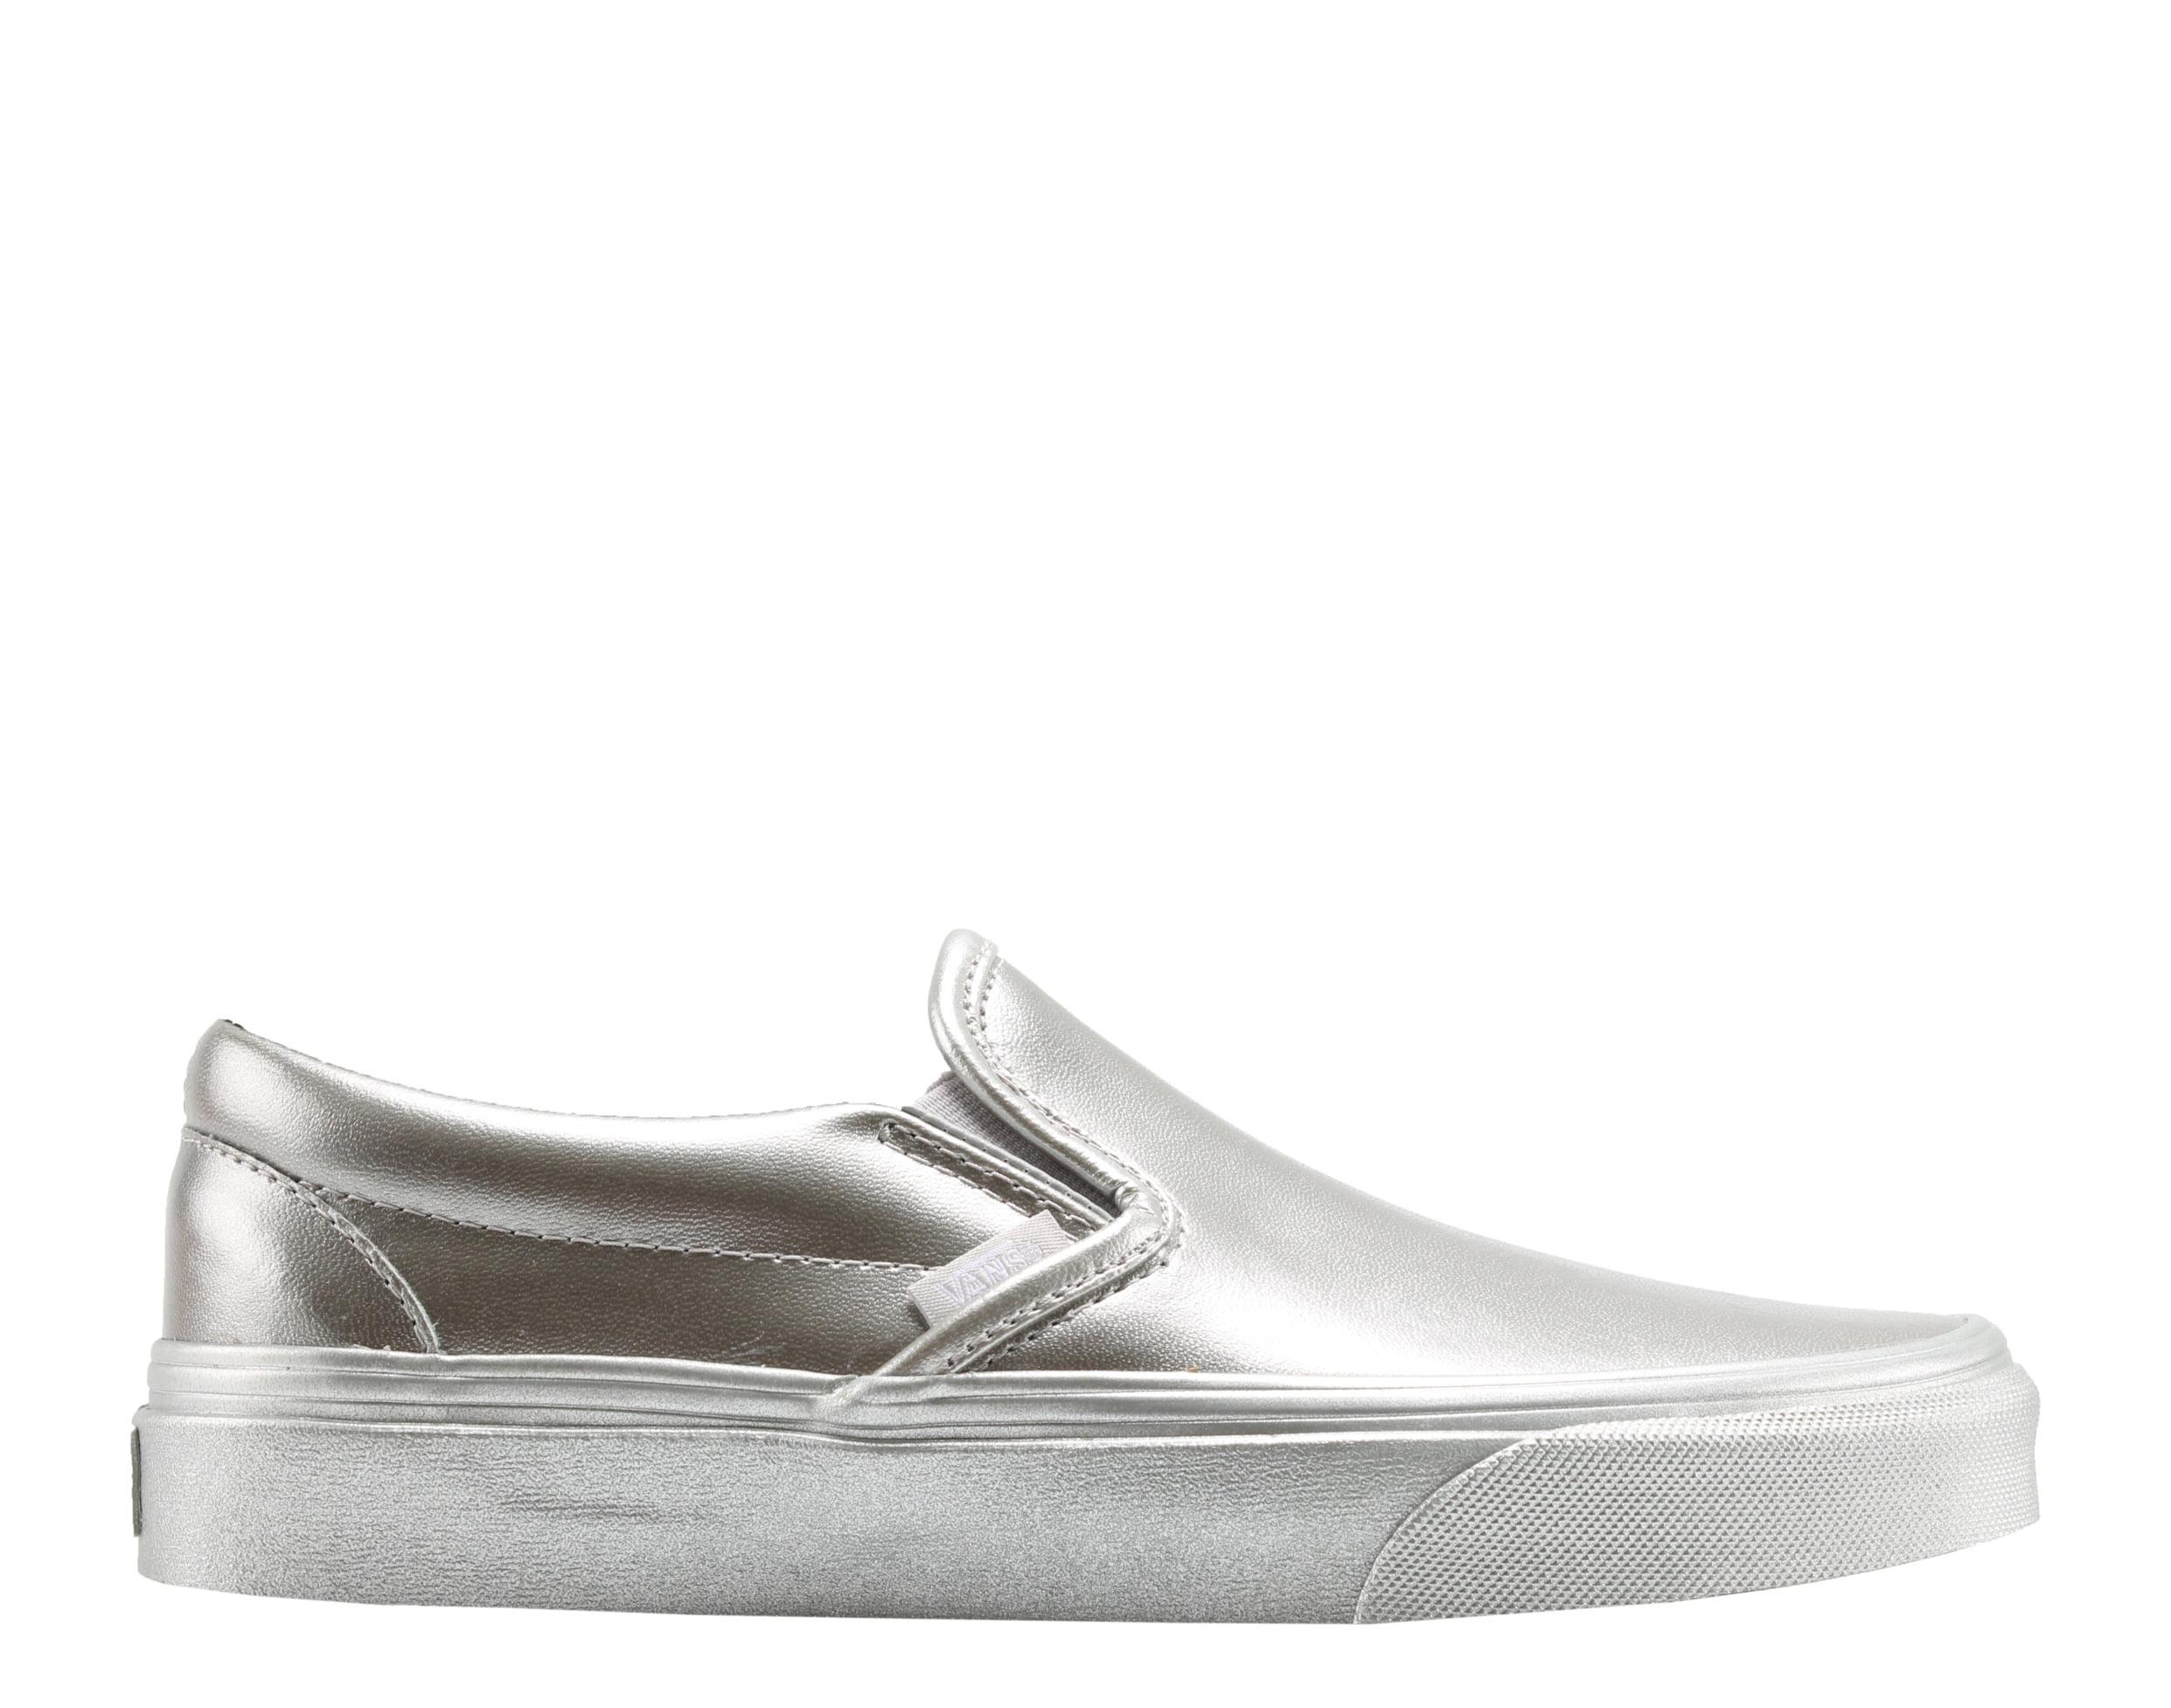 5a61c8bd4aae Vans - Vans Classic Slip On Metallic Sidewall Silver Low Top Sneakers  VN0A38F7QTV - Walmart.com